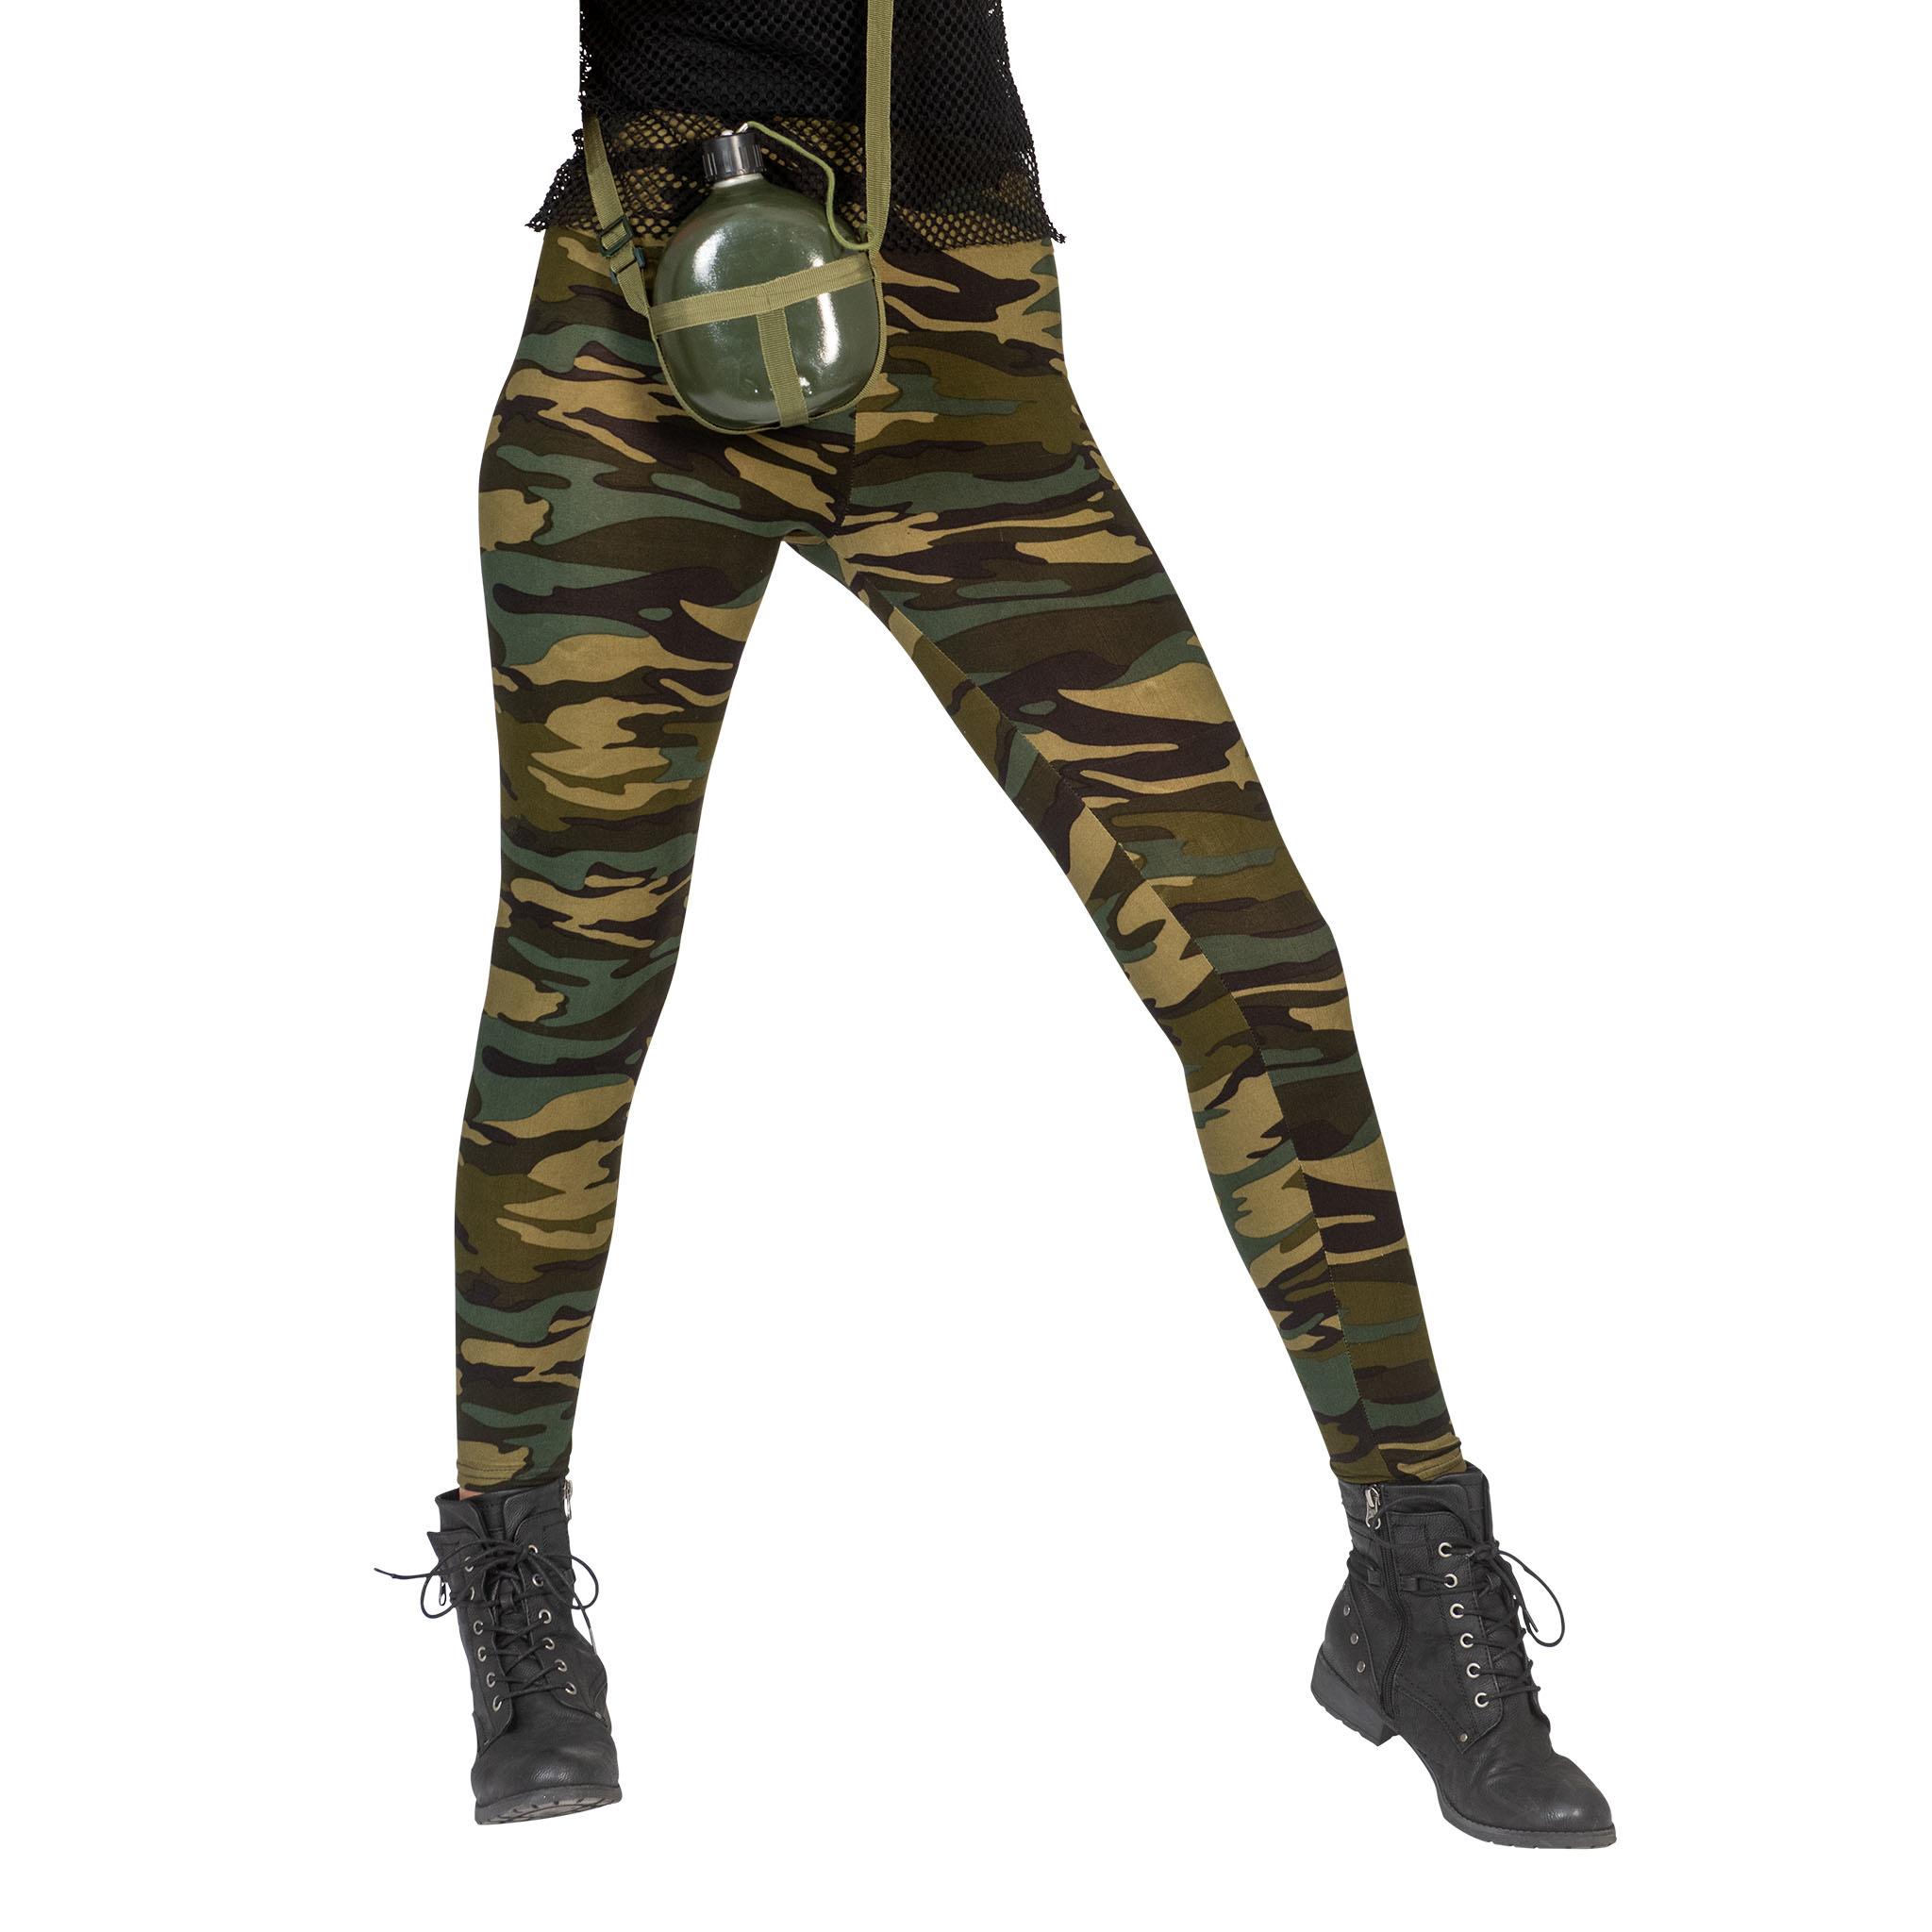 Legging Leger/ Camouflage   One Size